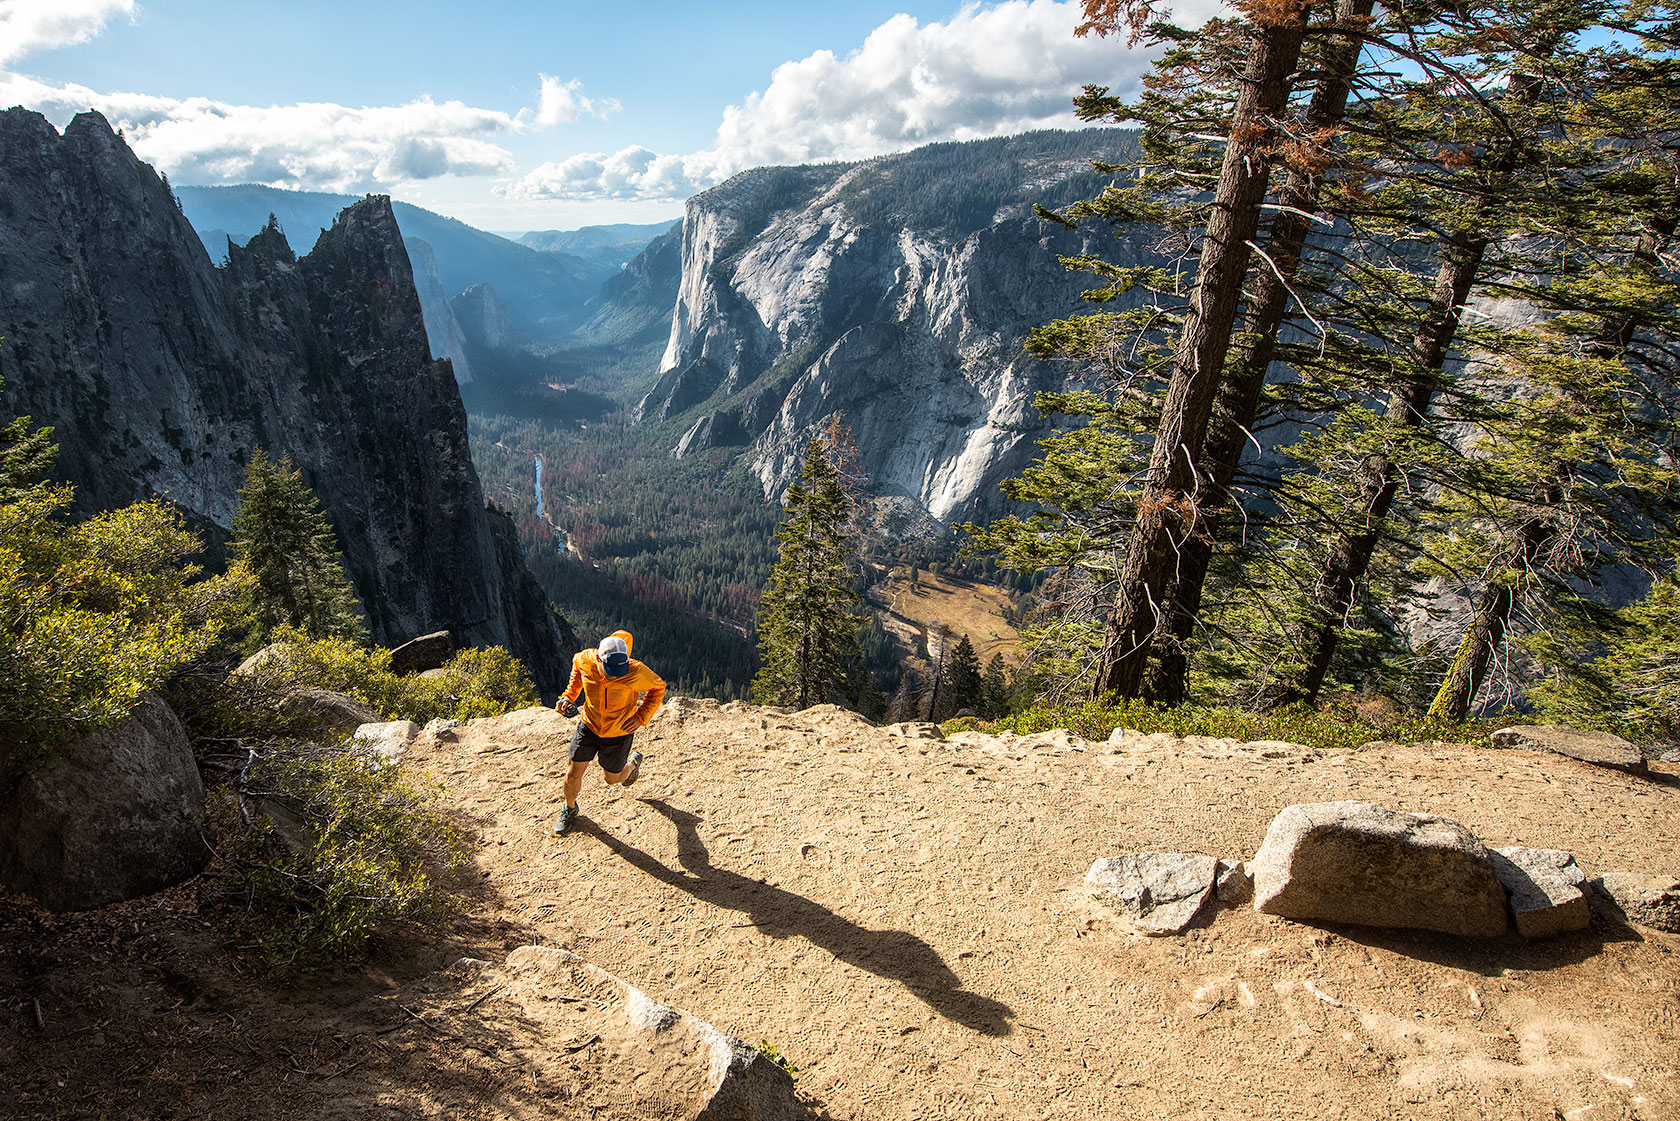 austin-trigg-yosemite-national-park-trail-Running-four-4-Mile-Trail-california-valley-adventure-afternnon-run.jpg